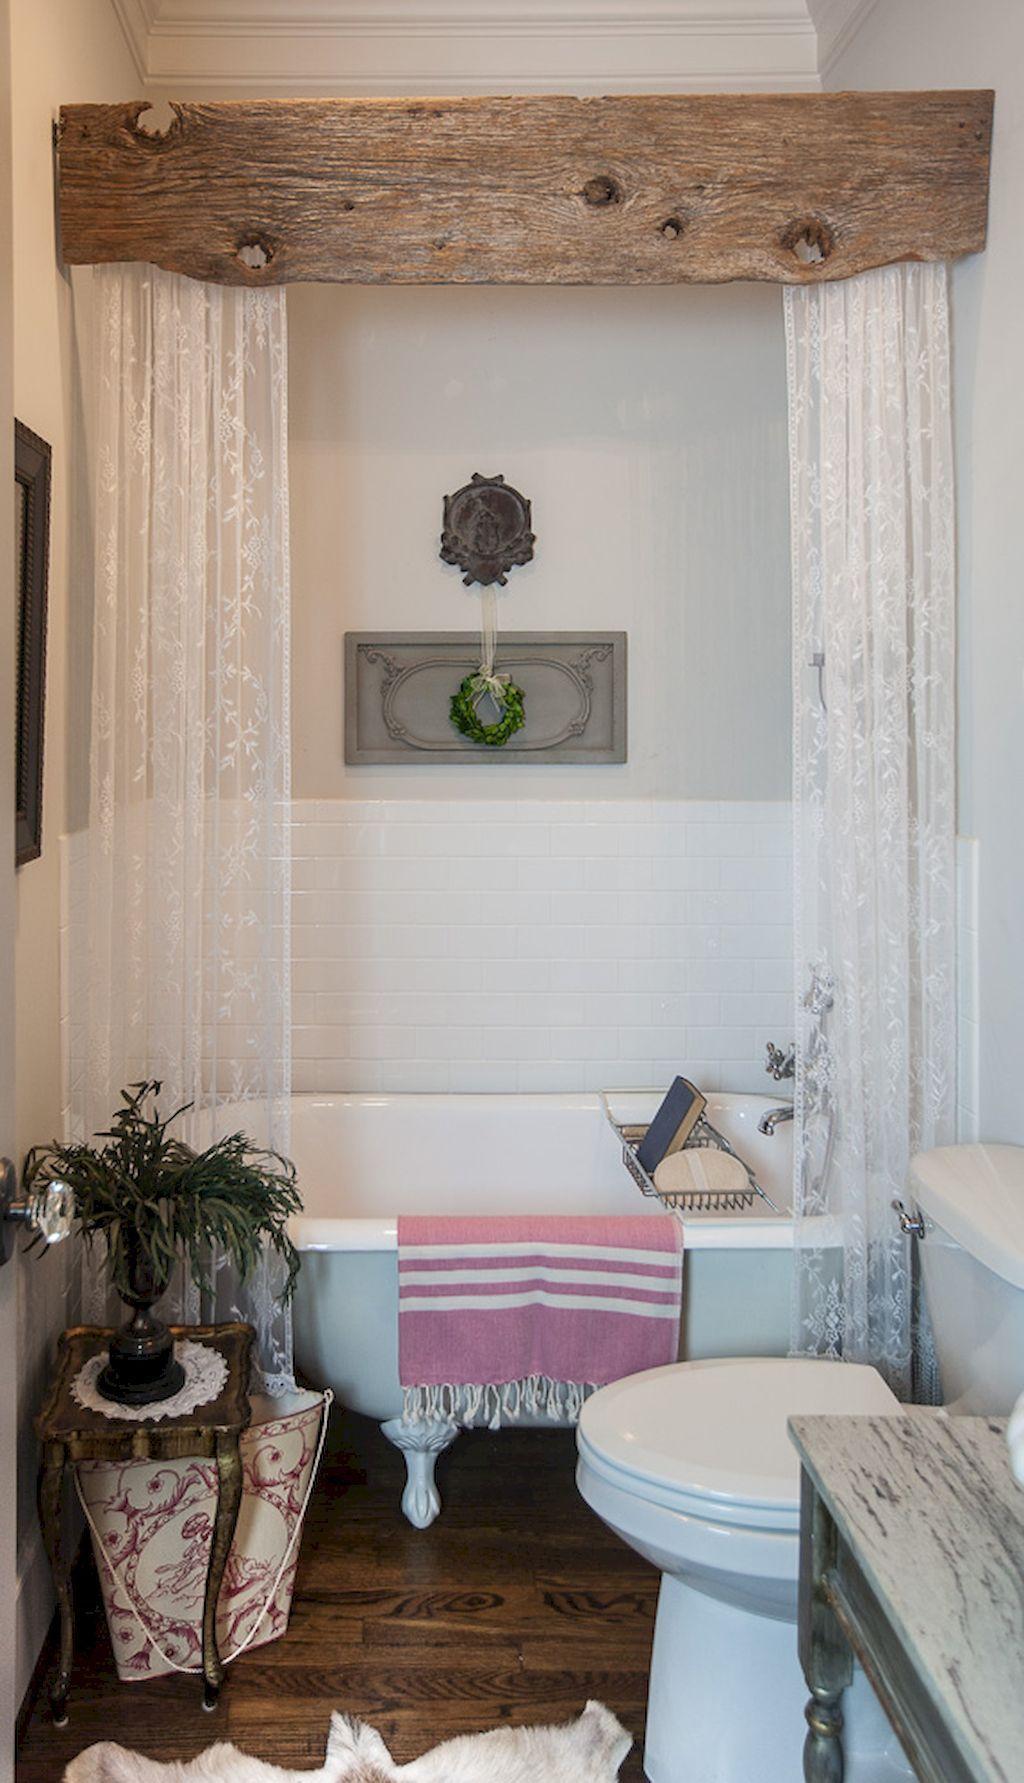 Rustic farmhouse decor ideas on a budget budgethomedecorating